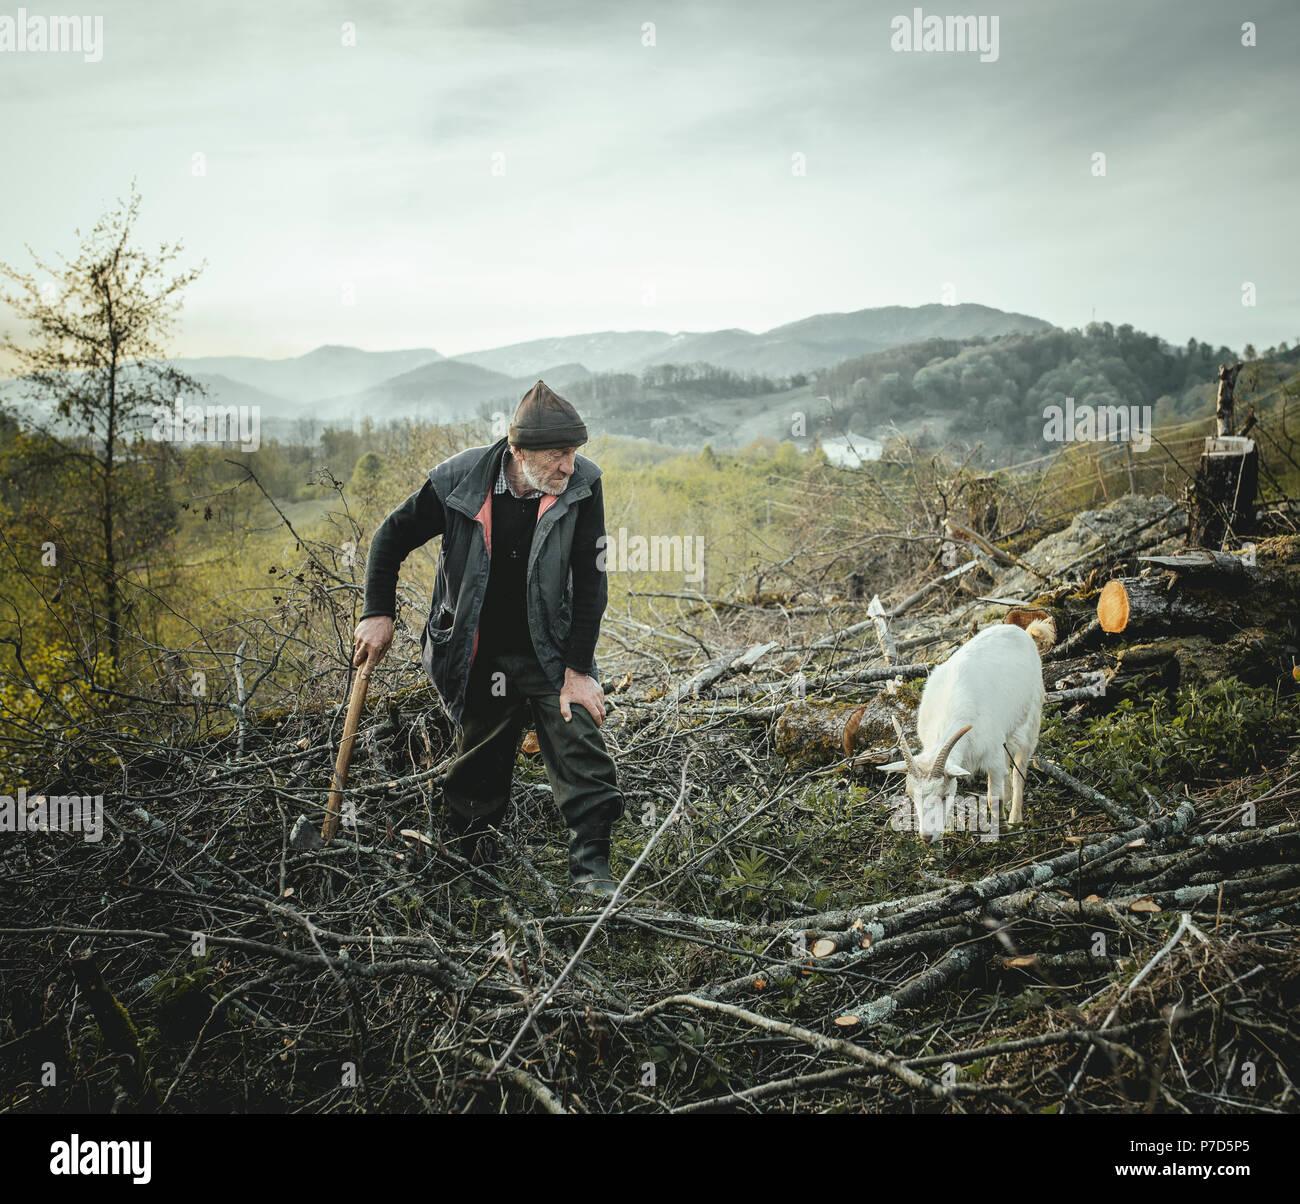 Shepherd with goat in Arasadzikh, he collects firewood, Arasadzikh, Abkhazia, Georgia - Stock Image